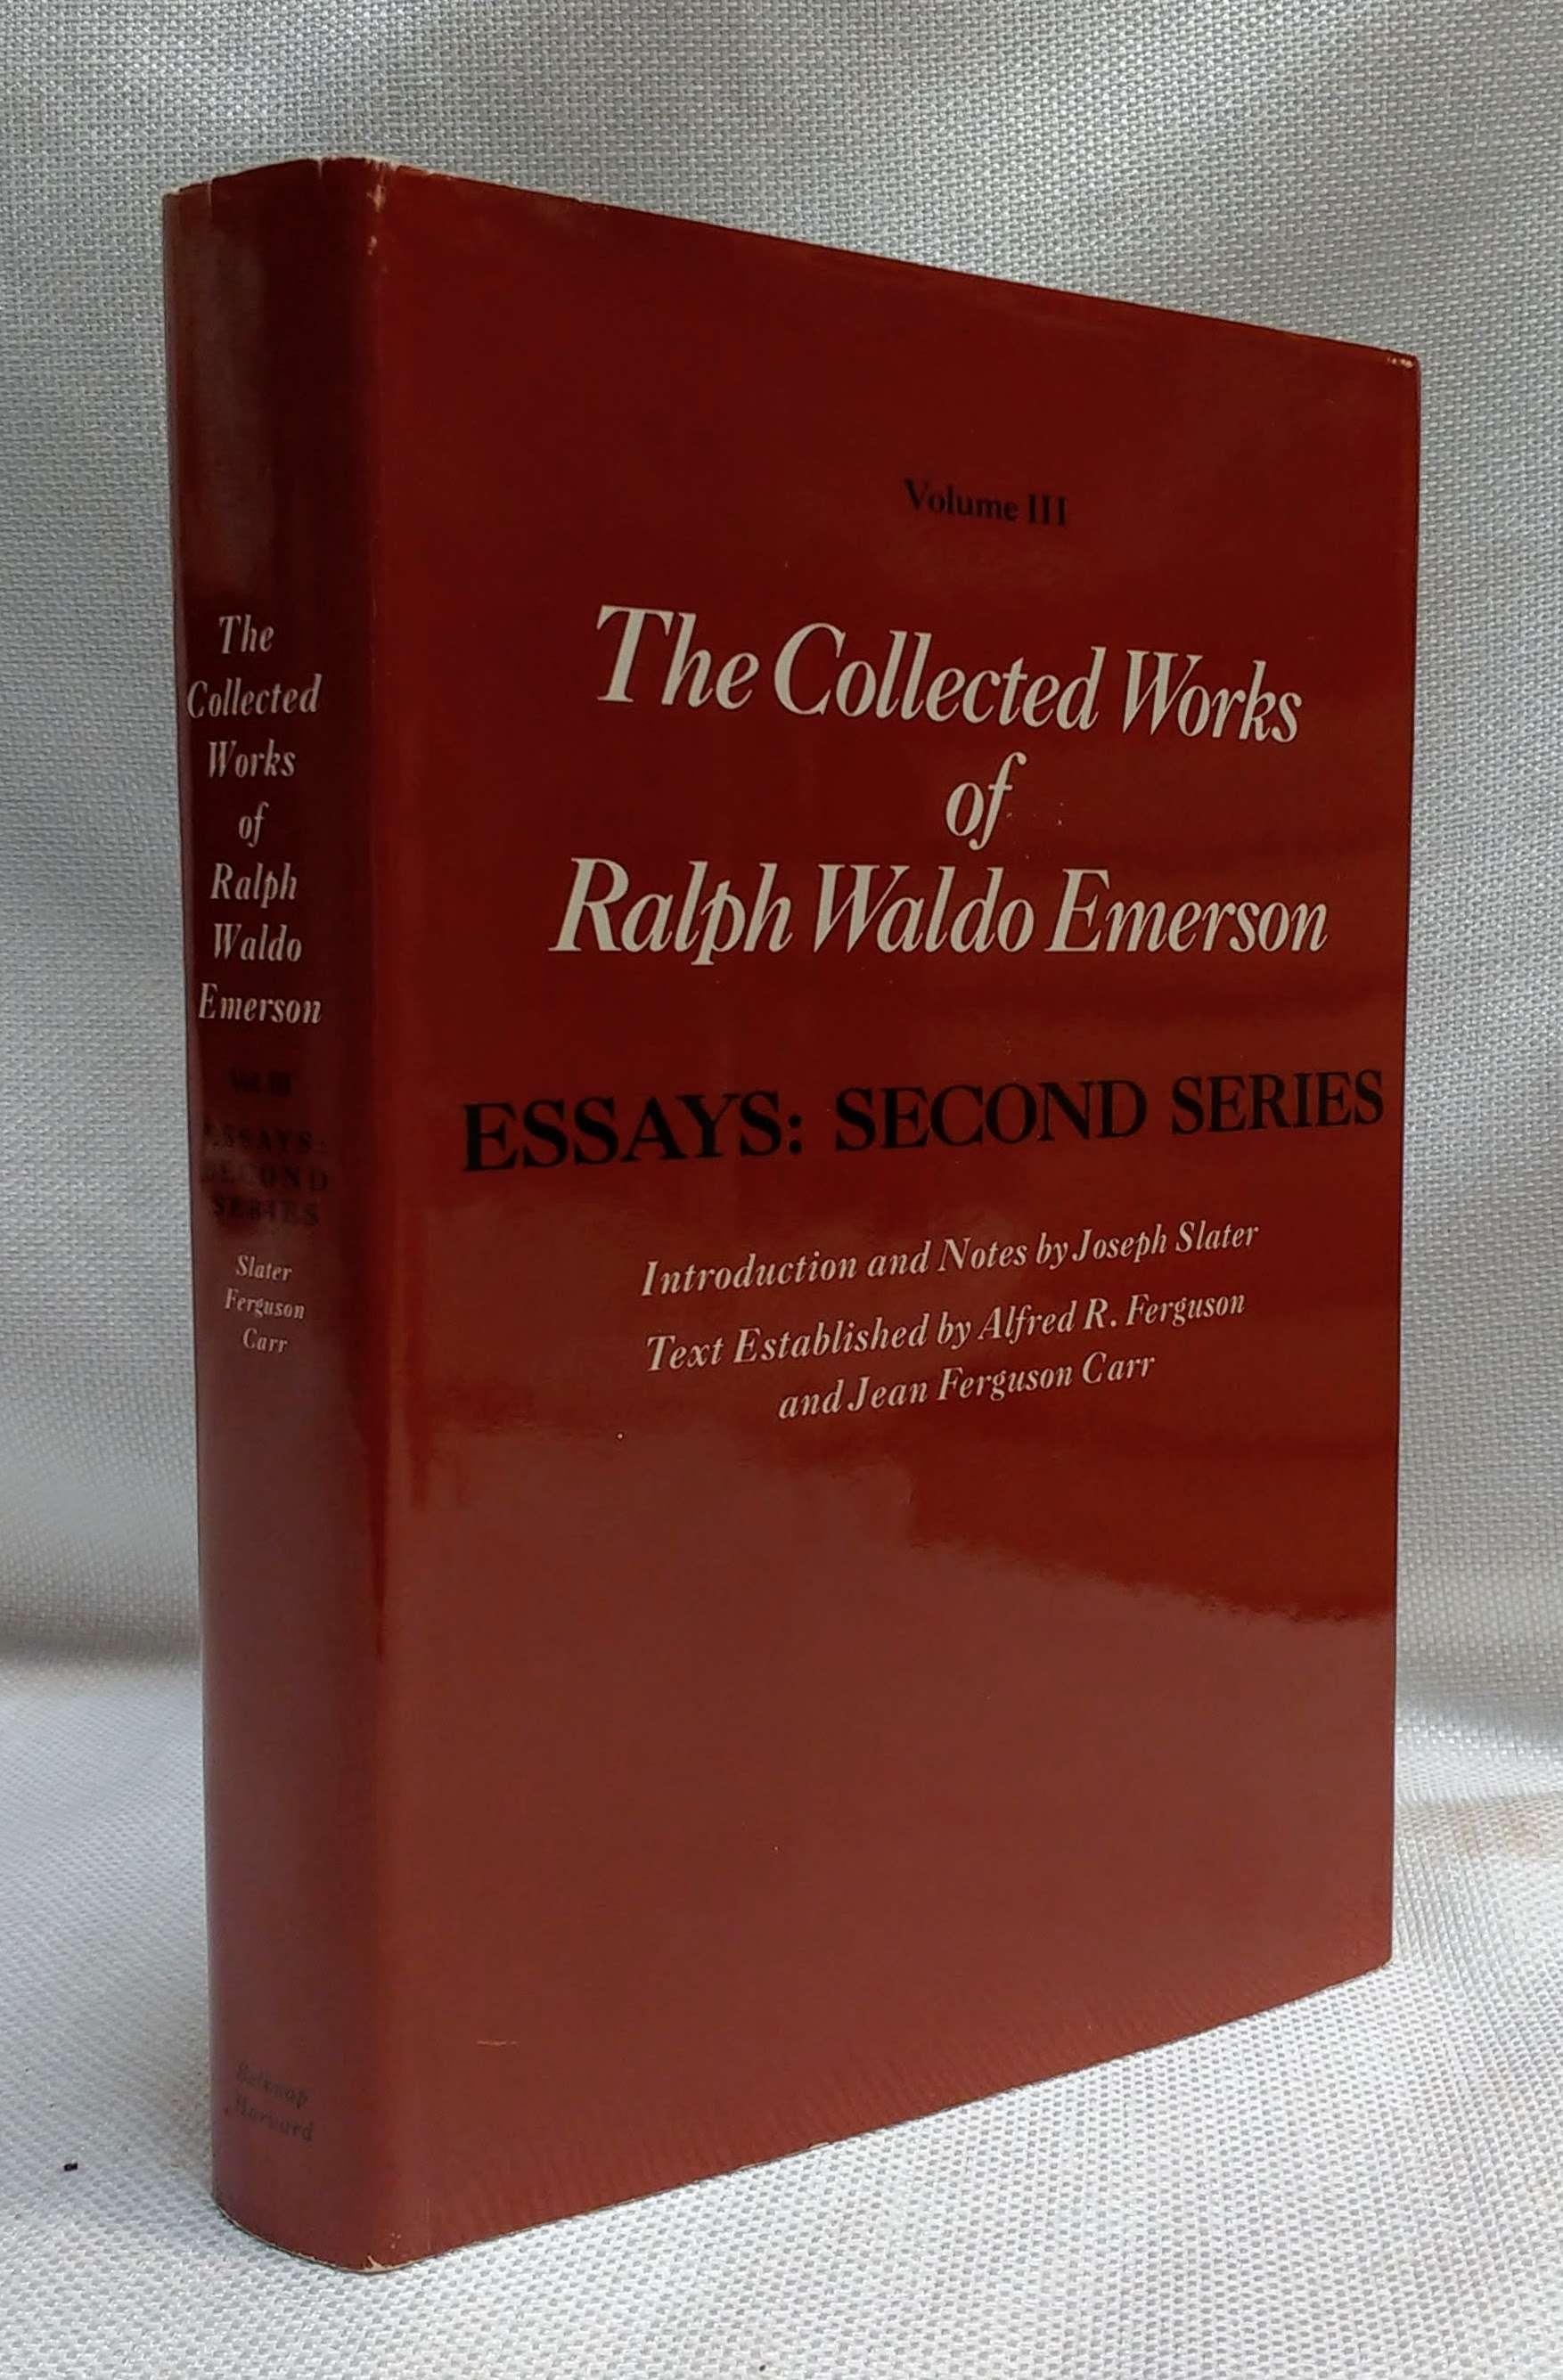 Collected Works of Ralph Waldo Emerson, Volume III: Essays: Second Series, Emerson, Ralph Waldo; Slater, Joseph [Editor]; Ferguson, Alfred R. [Editor]; Carr, Jean Ferguson [Editor];